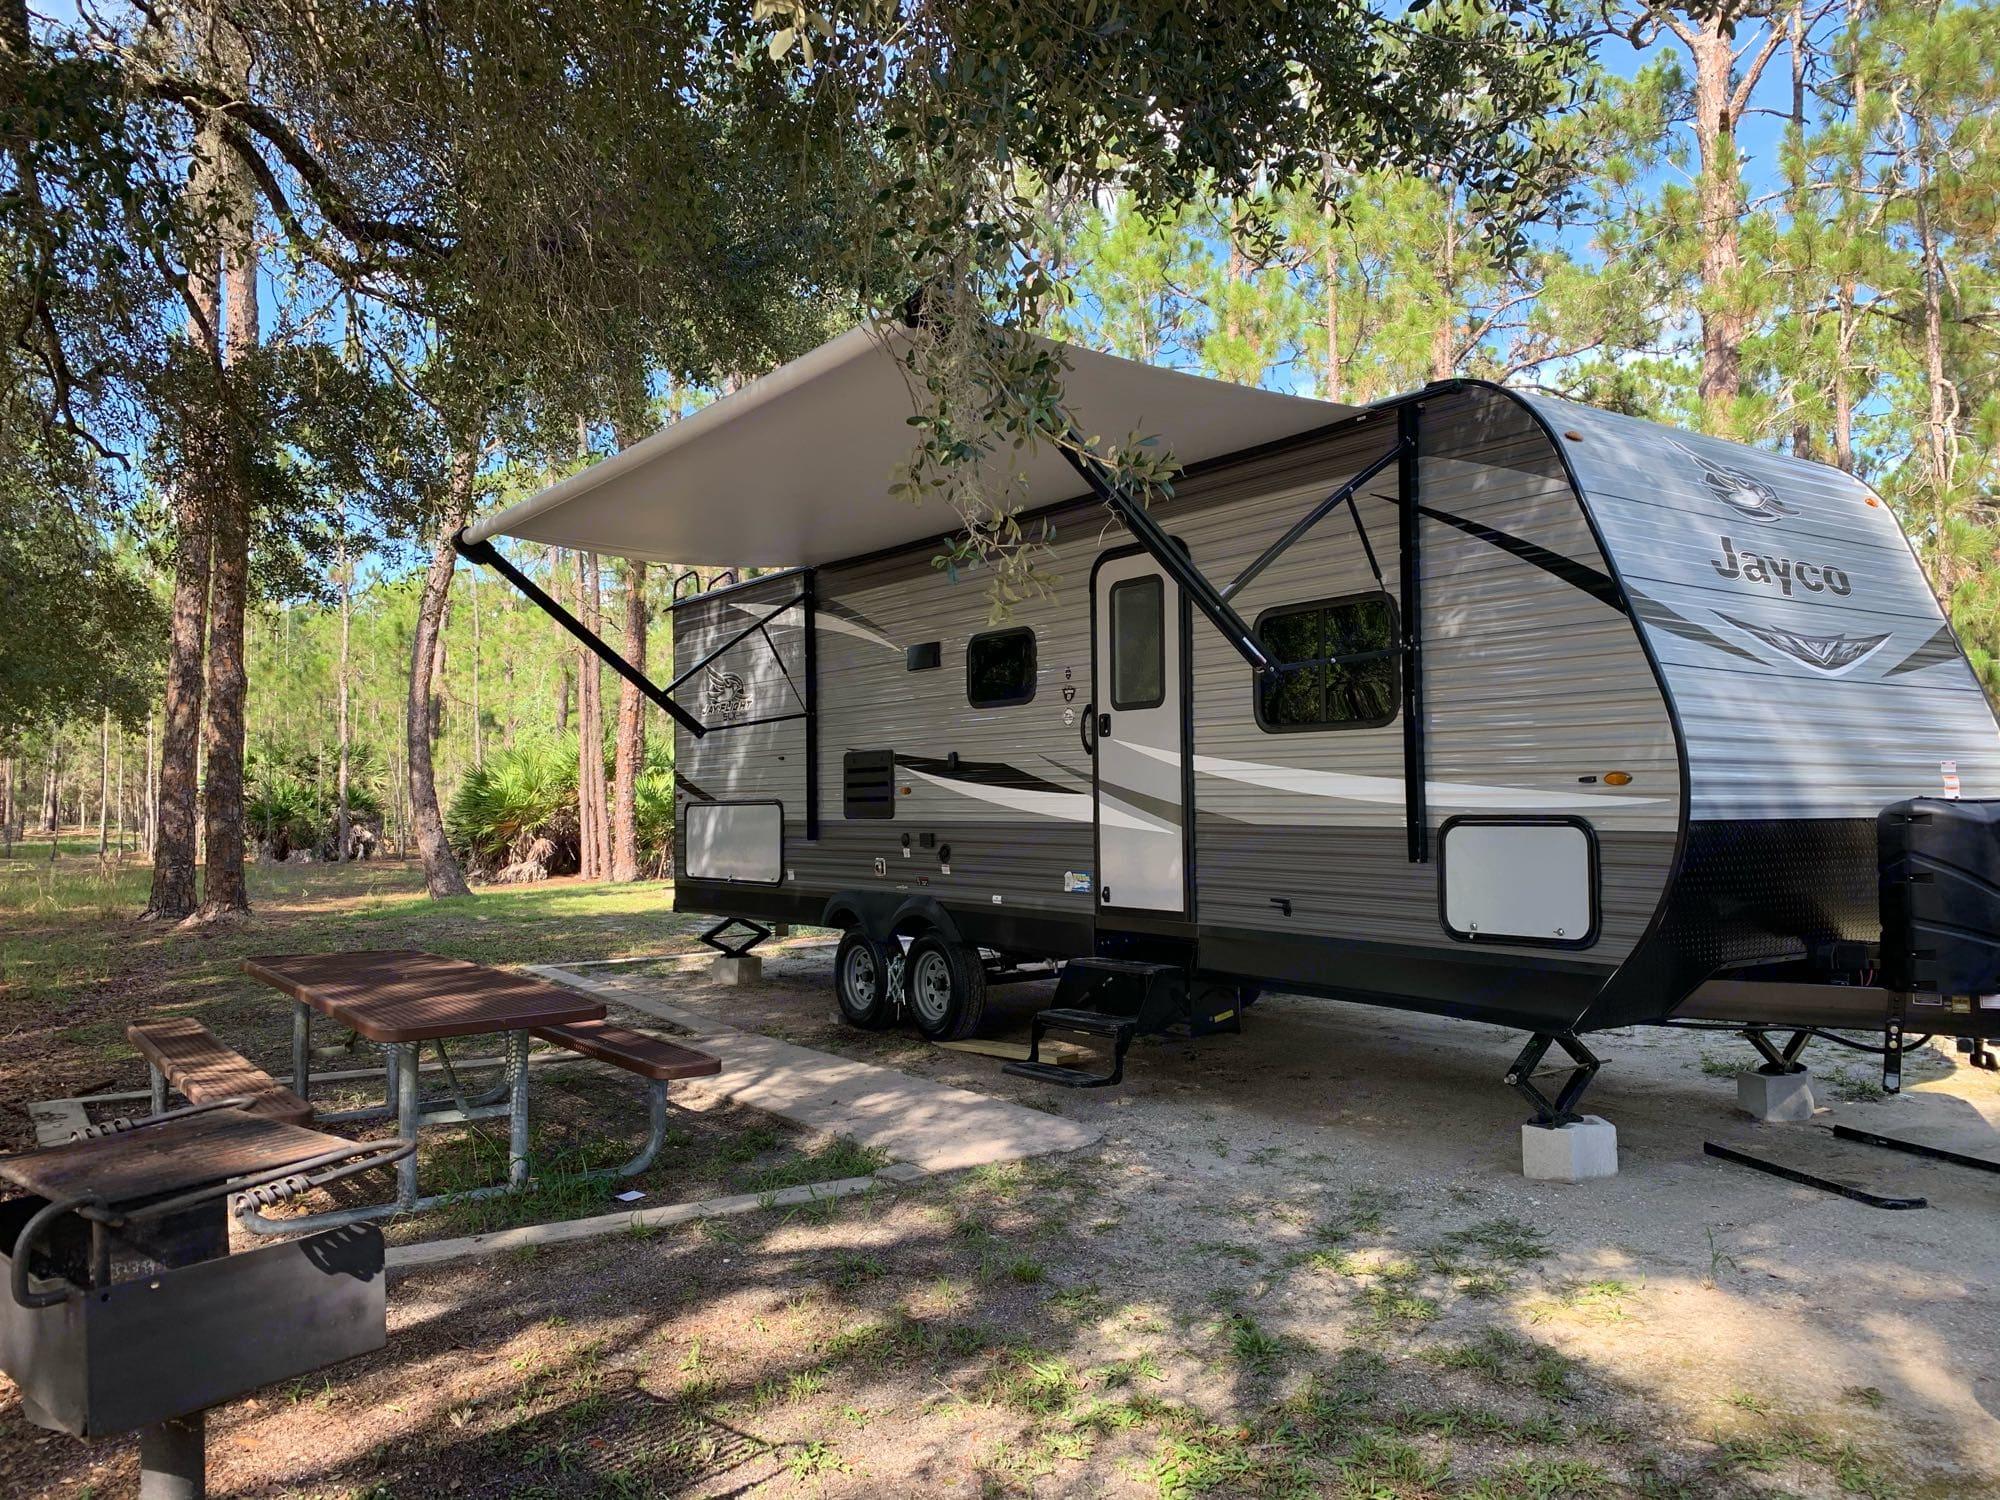 Moss Park Camping Grounds. Jayco JayFlight 2021